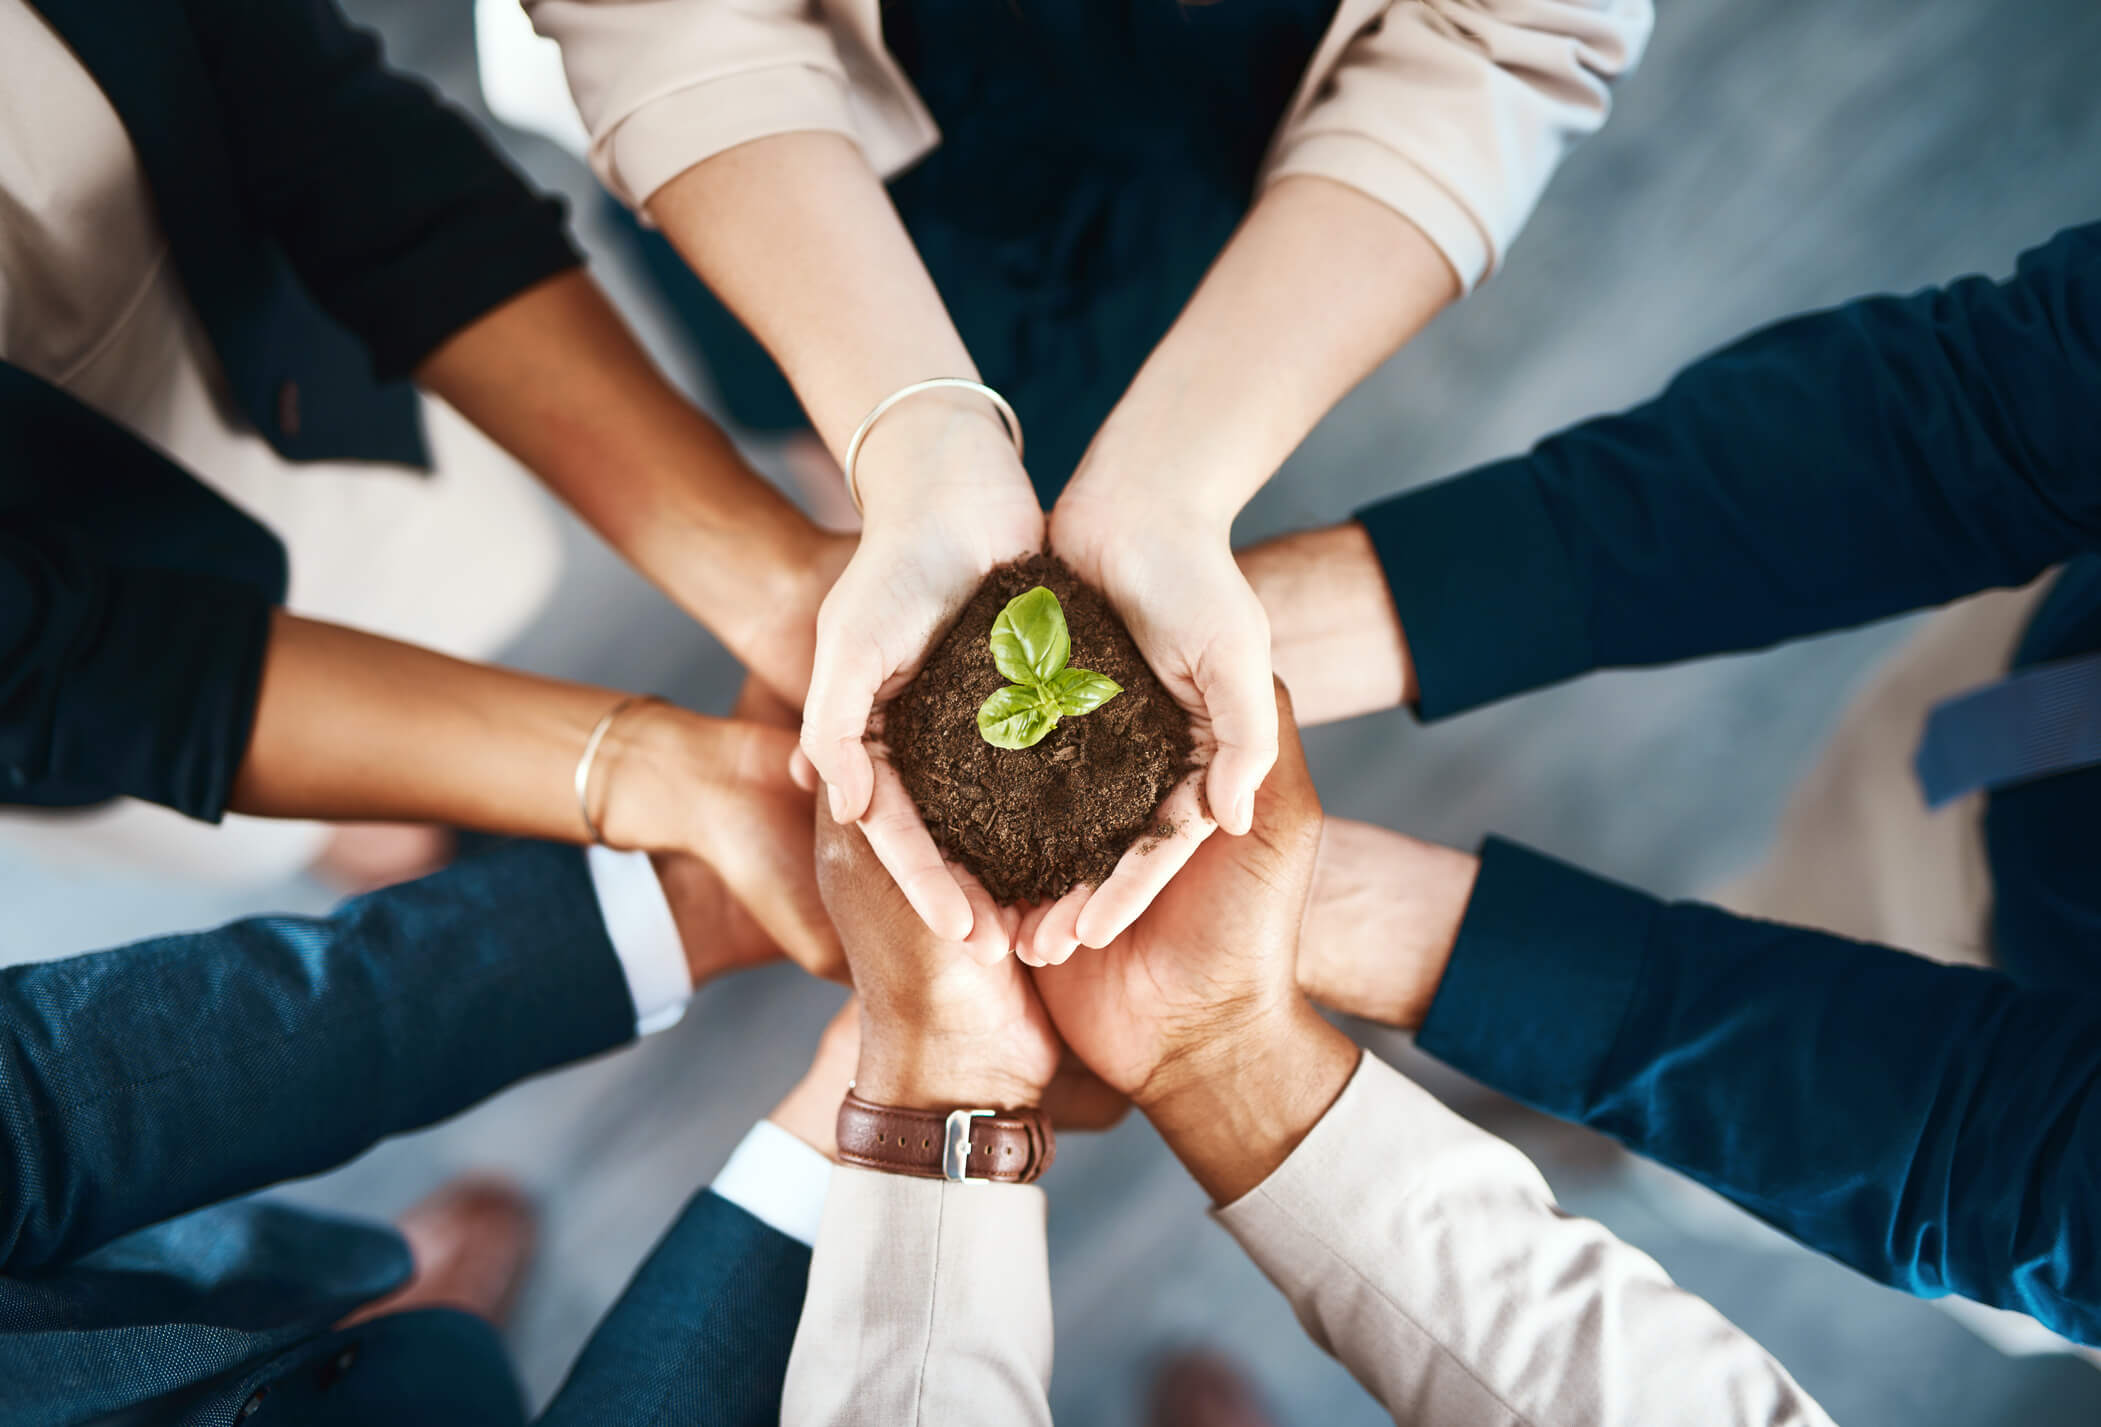 desenvolvimento-sustentável-meg-fnq